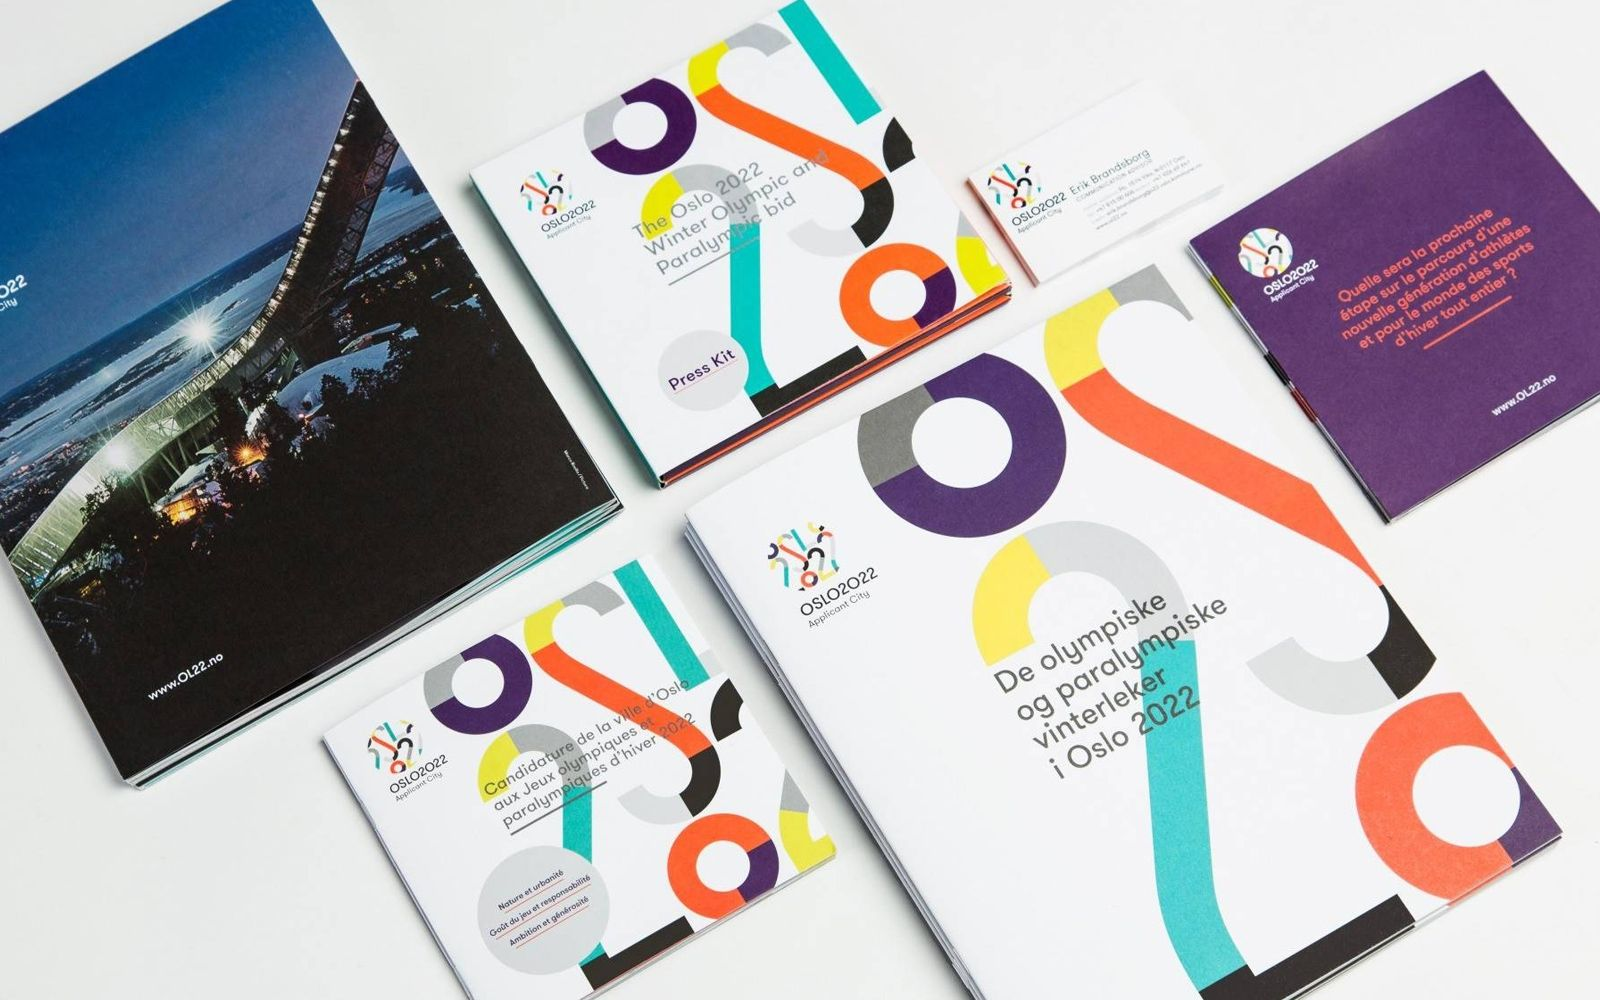 Oslo 2022 Winter Olympic & Paralympic Bid Grilli Type